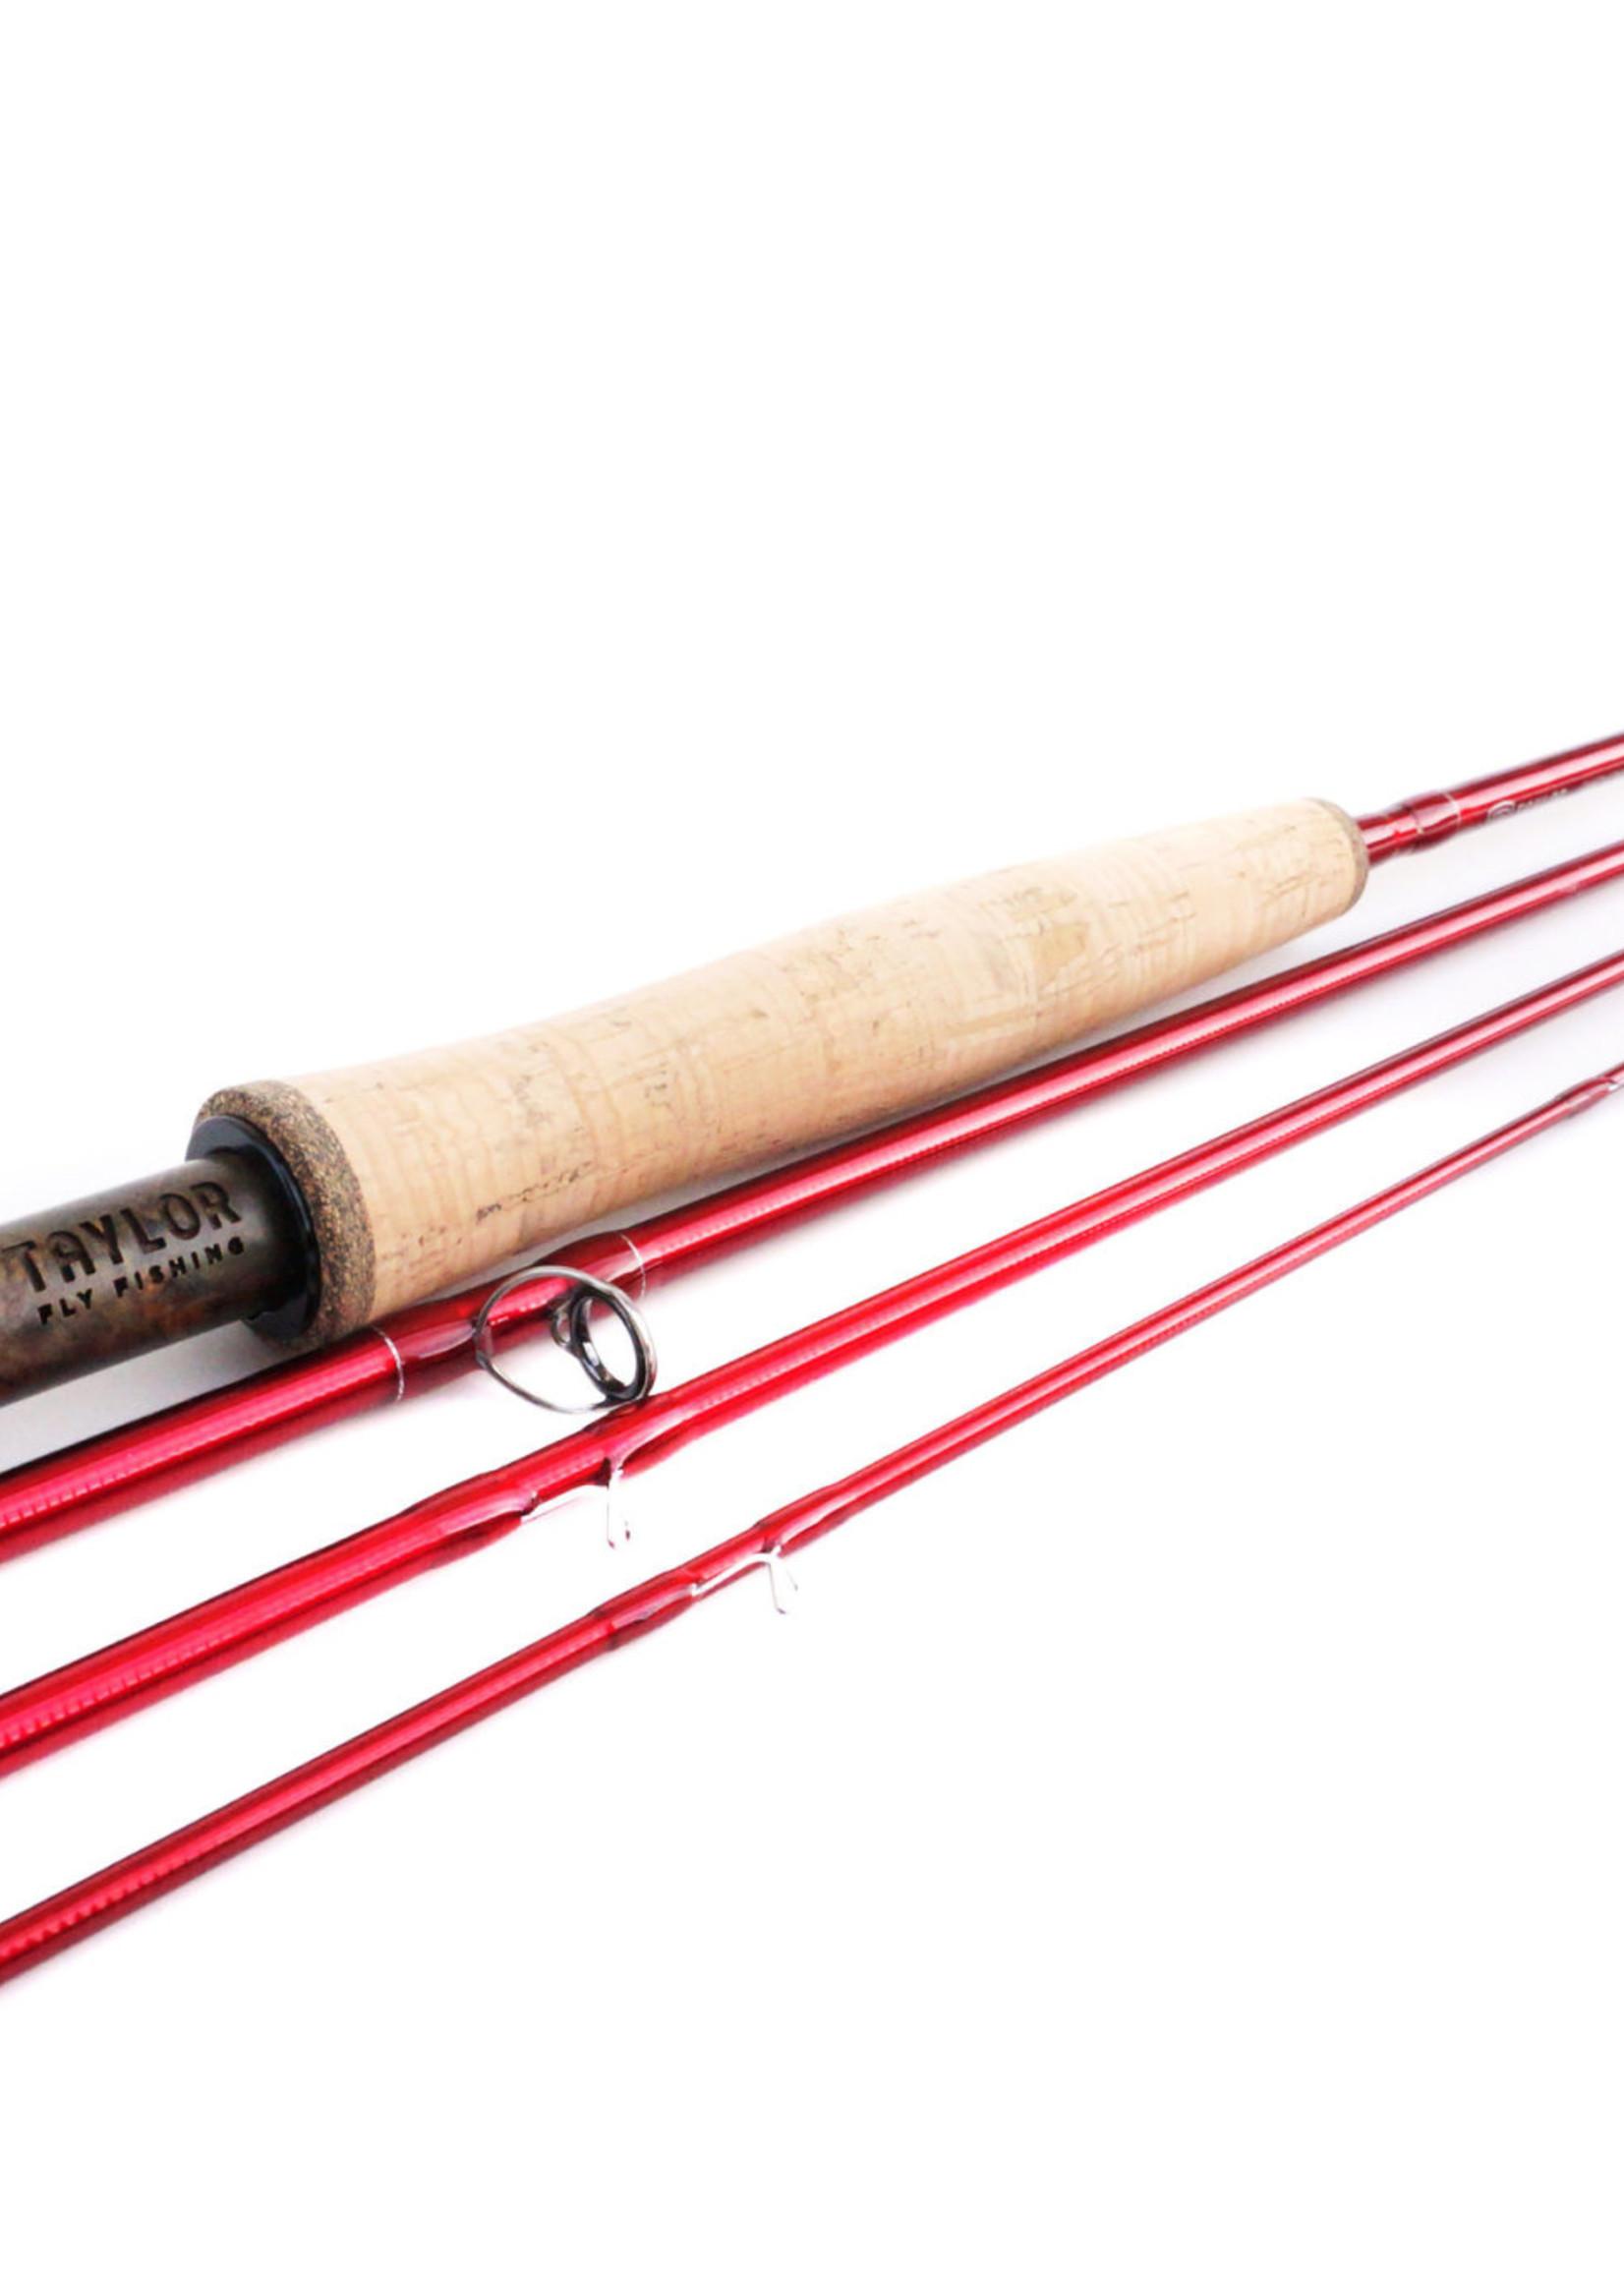 TAYLOR FLY FISHING TAYLOR FLY FISHING - PHENOM MII